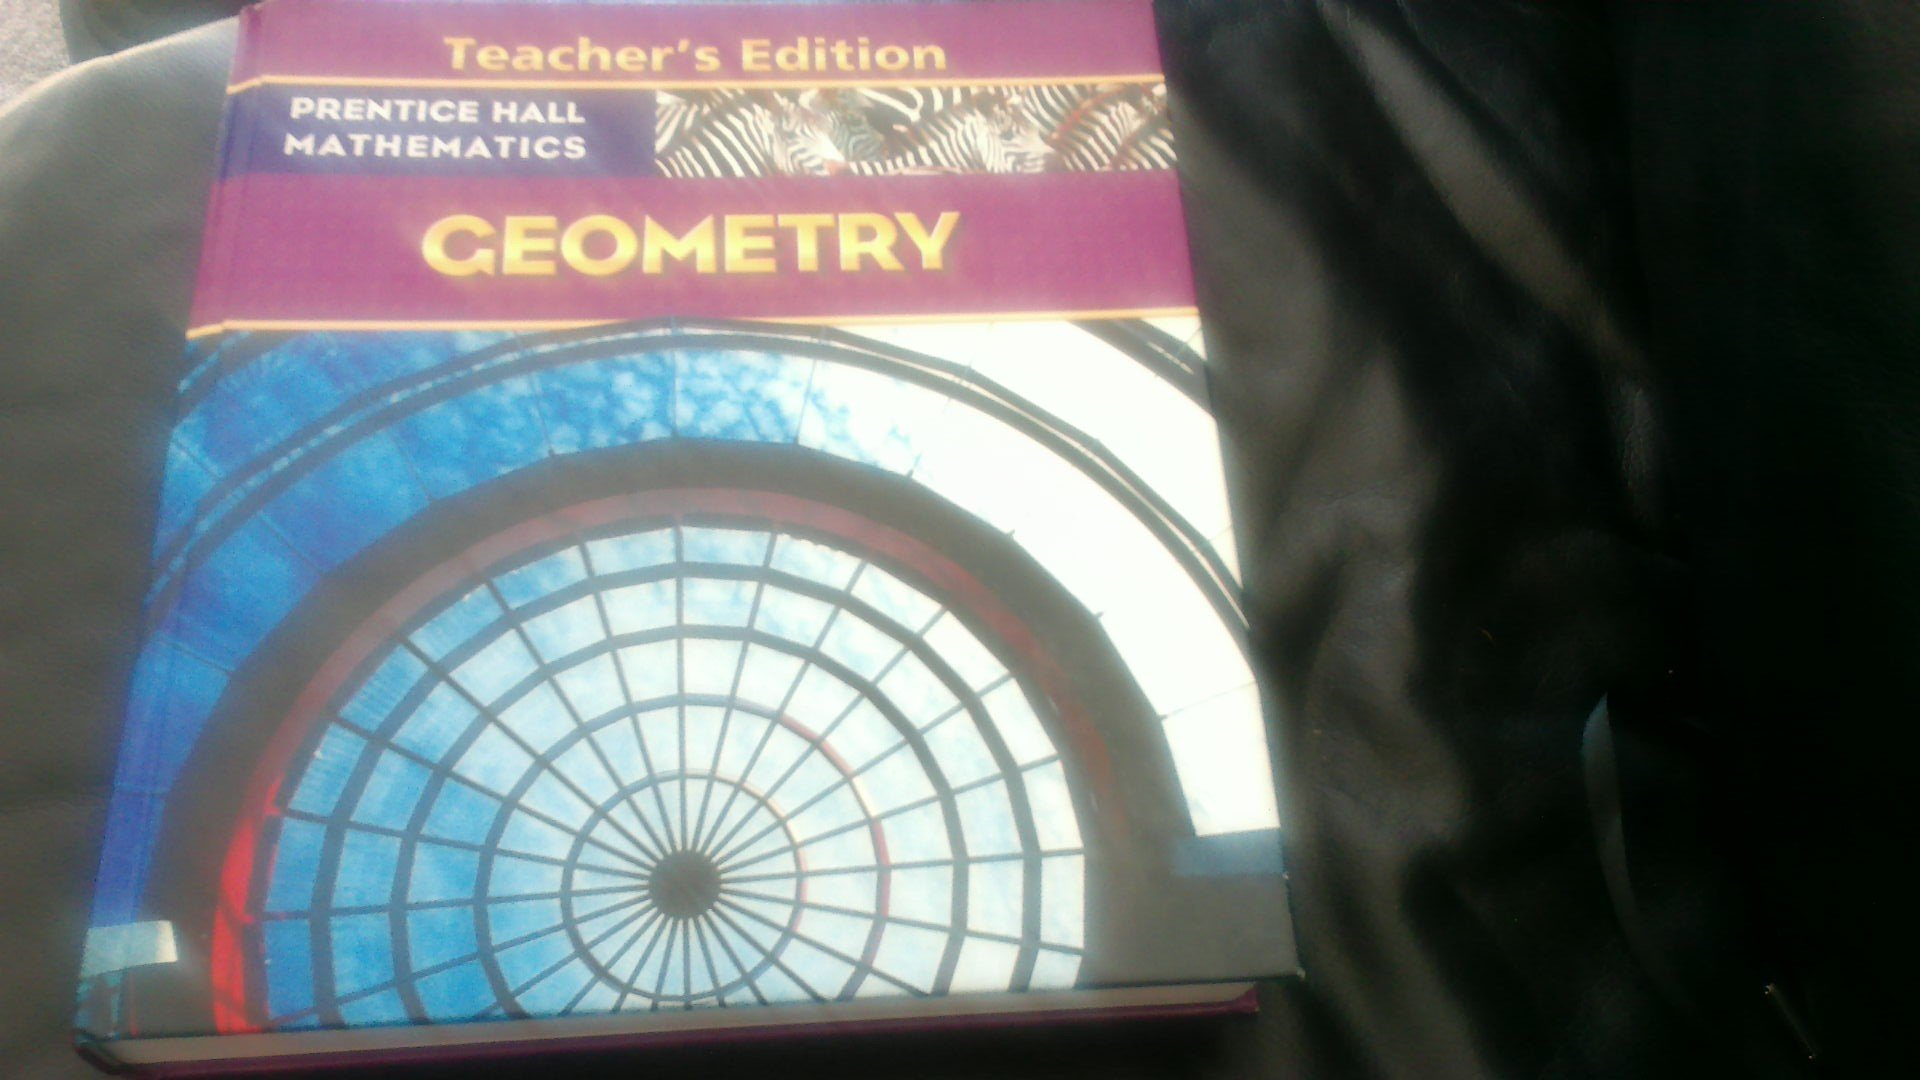 Download Prentice Hall Mathematics: Geometry, Teacher's Edition PDF